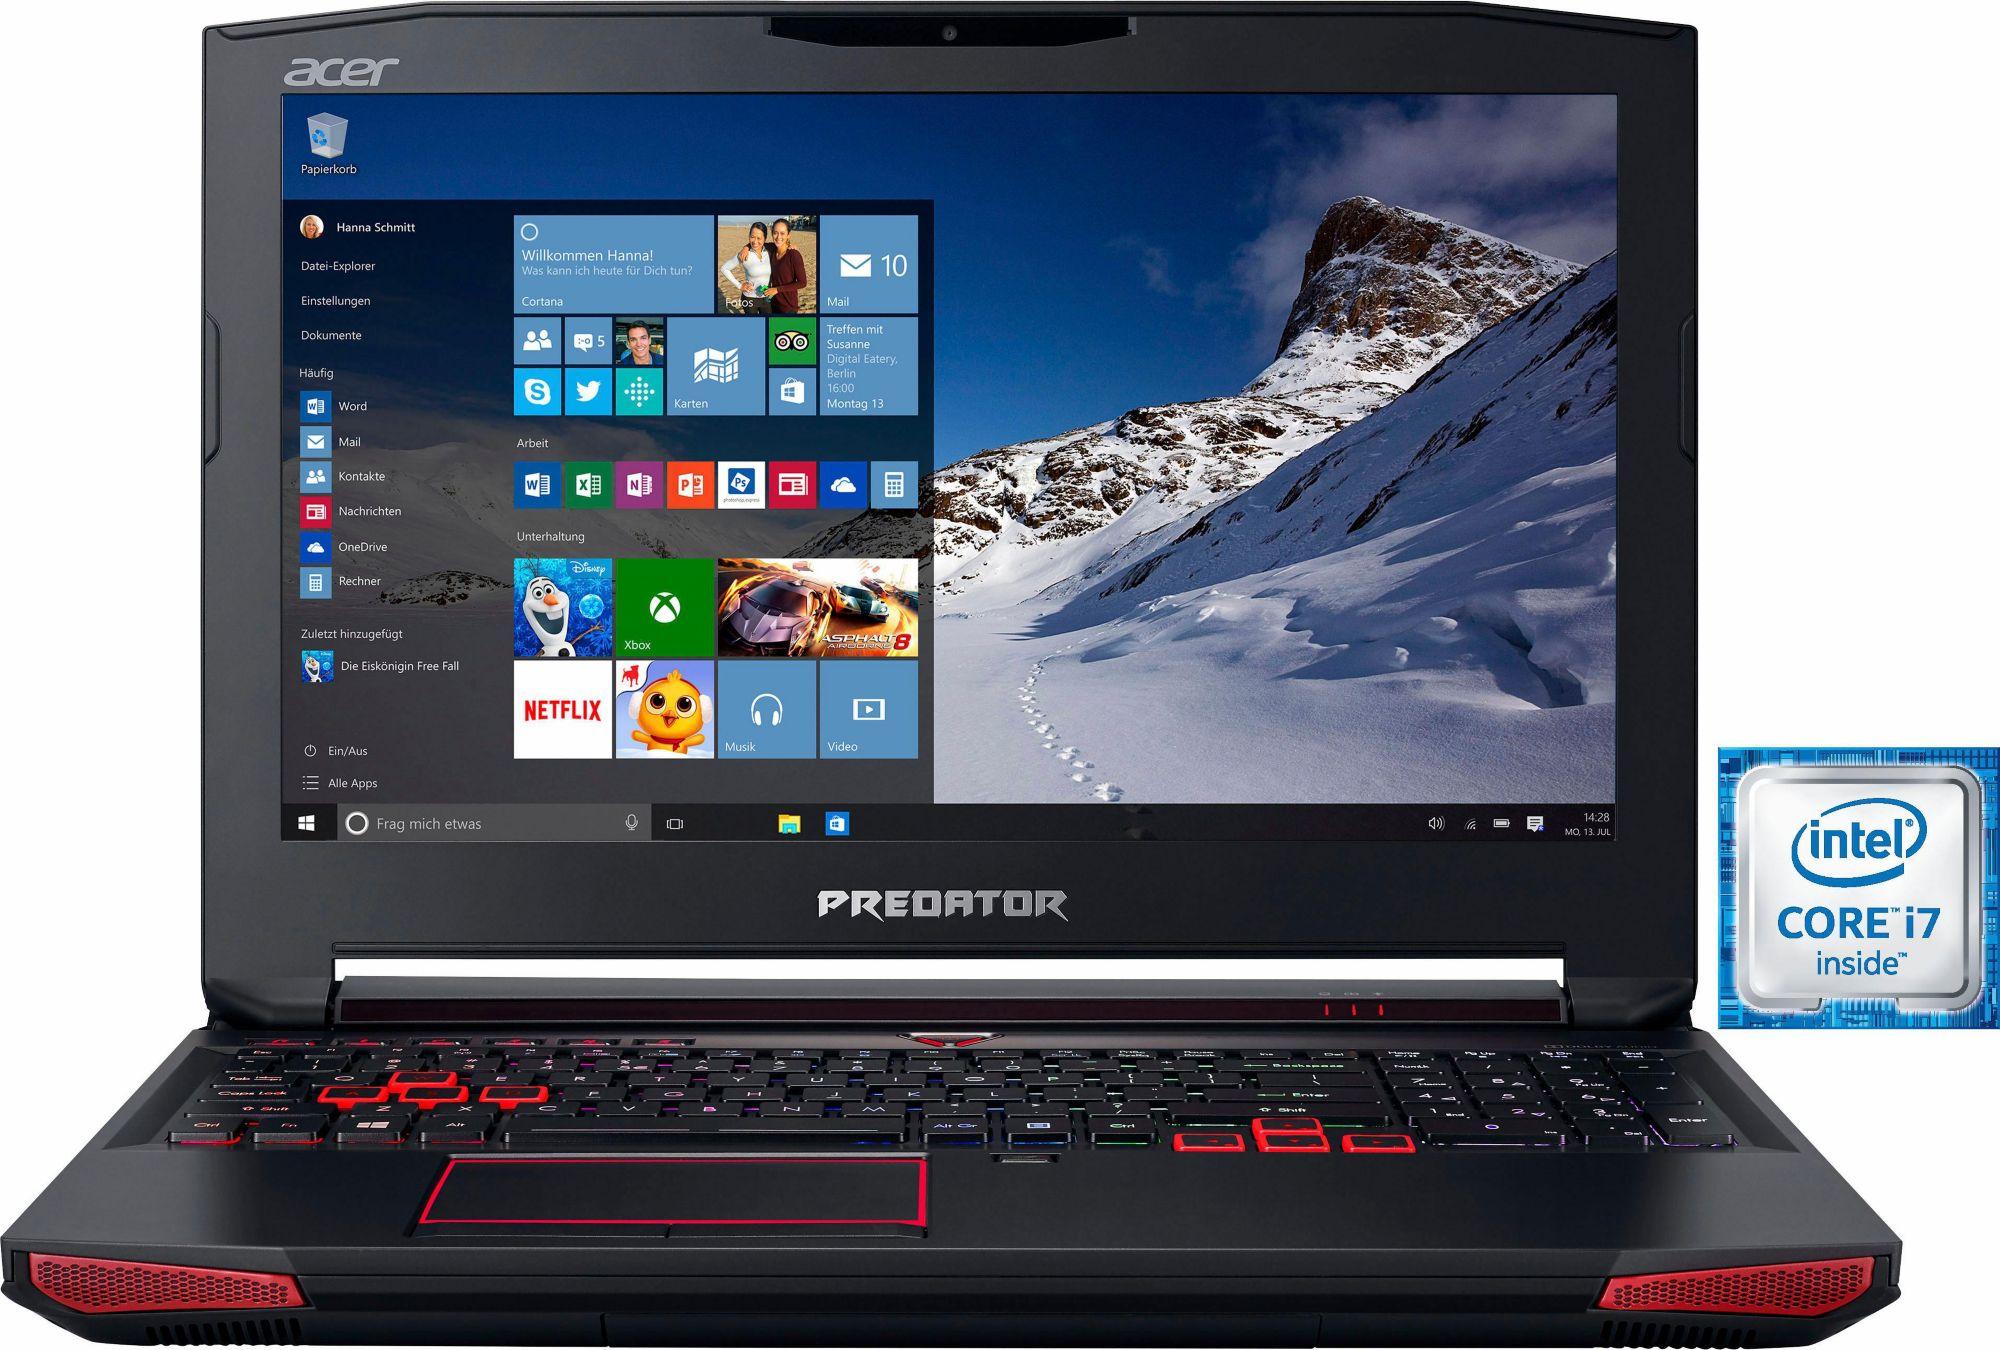 ACER Acer Predator 15 (G9-593-74VX) Notebook, Intel® Core? i7, 39,6 cm (15,6 Zoll), 1256 GB Speicher